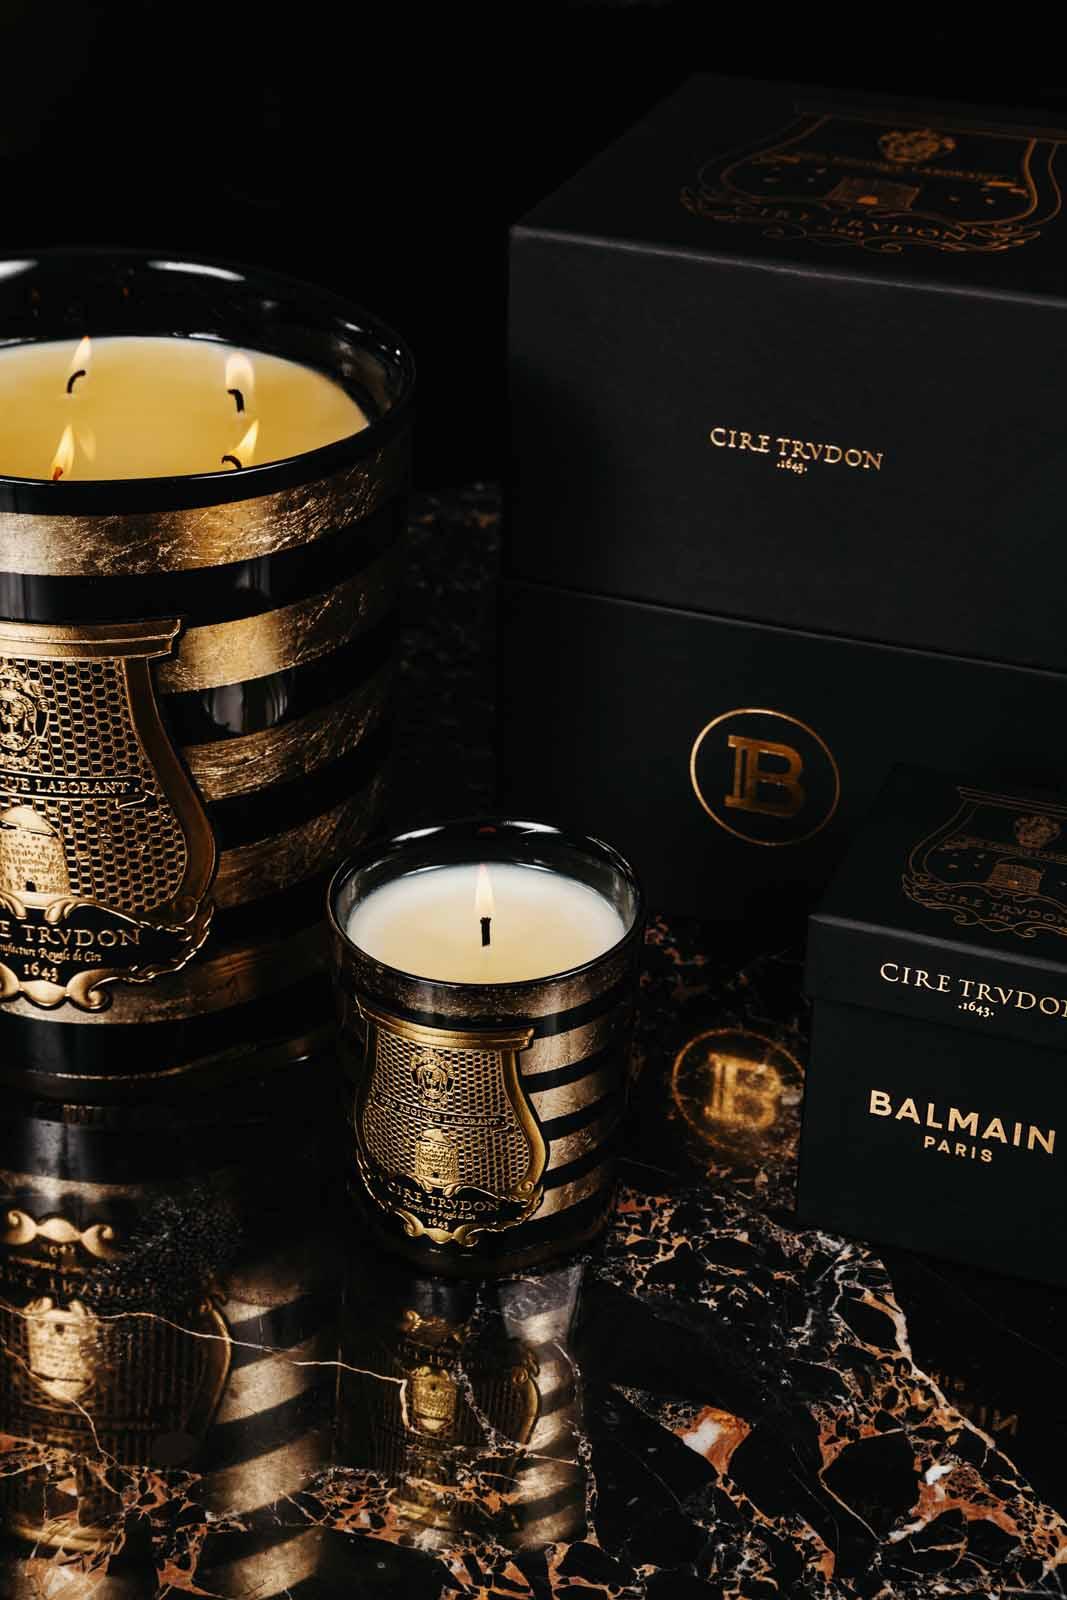 BALMAIN_TRUDON Kerze